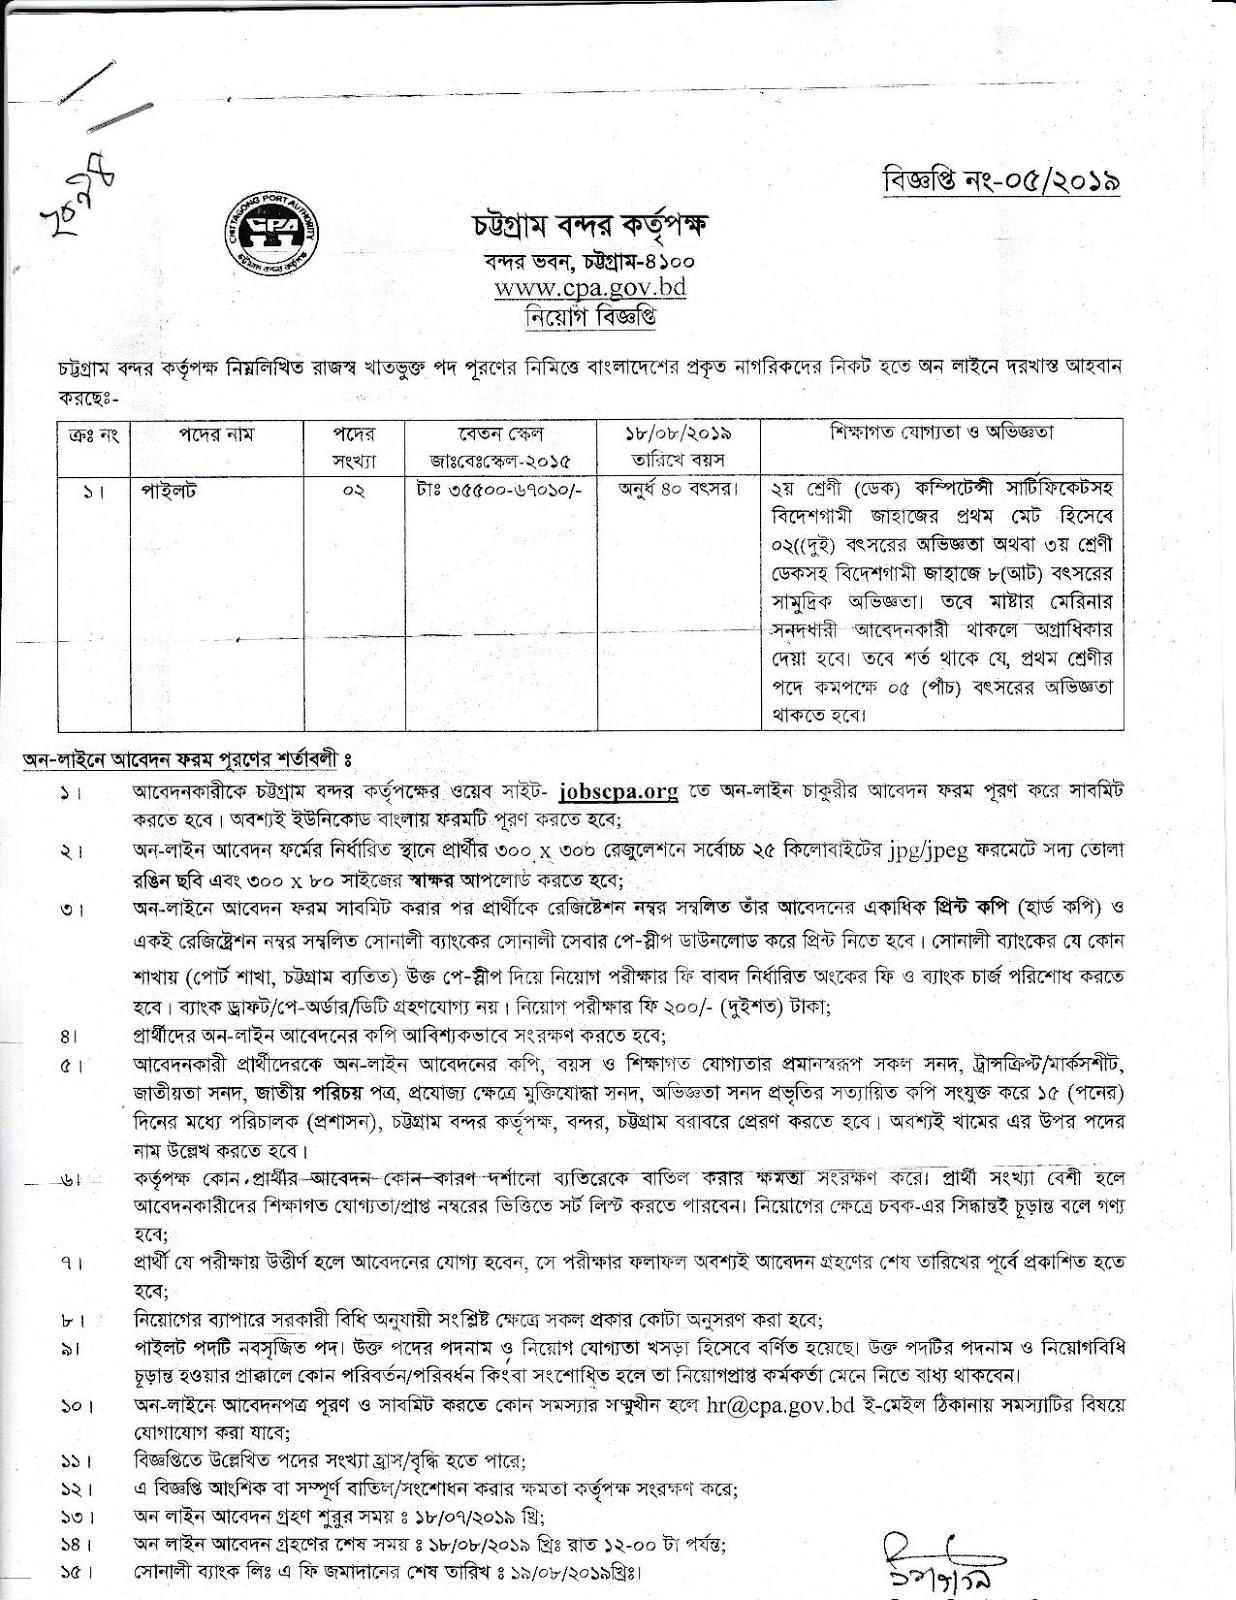 Chittagong Port Authority Job Circular 2019